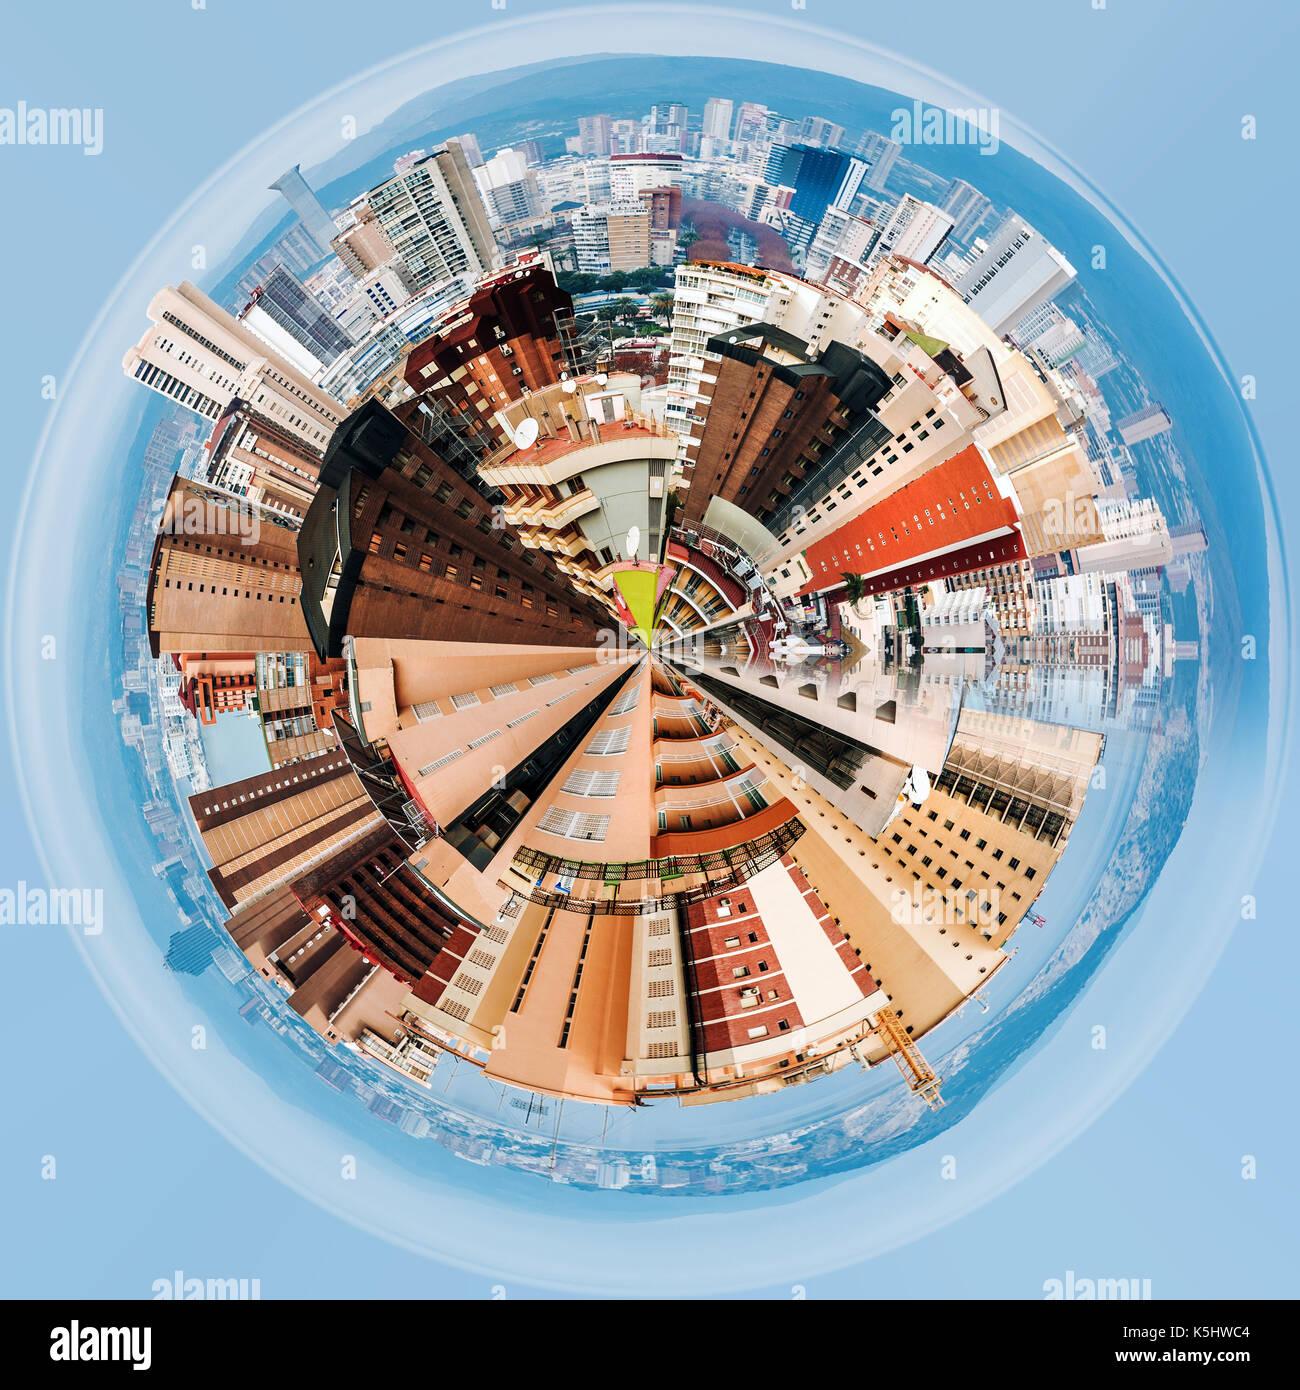 Little planet 360 degree sphere. Modern skyscrapers of Benidorm. Benidorm is a coastal city in Alicante, Spain - Stock Image